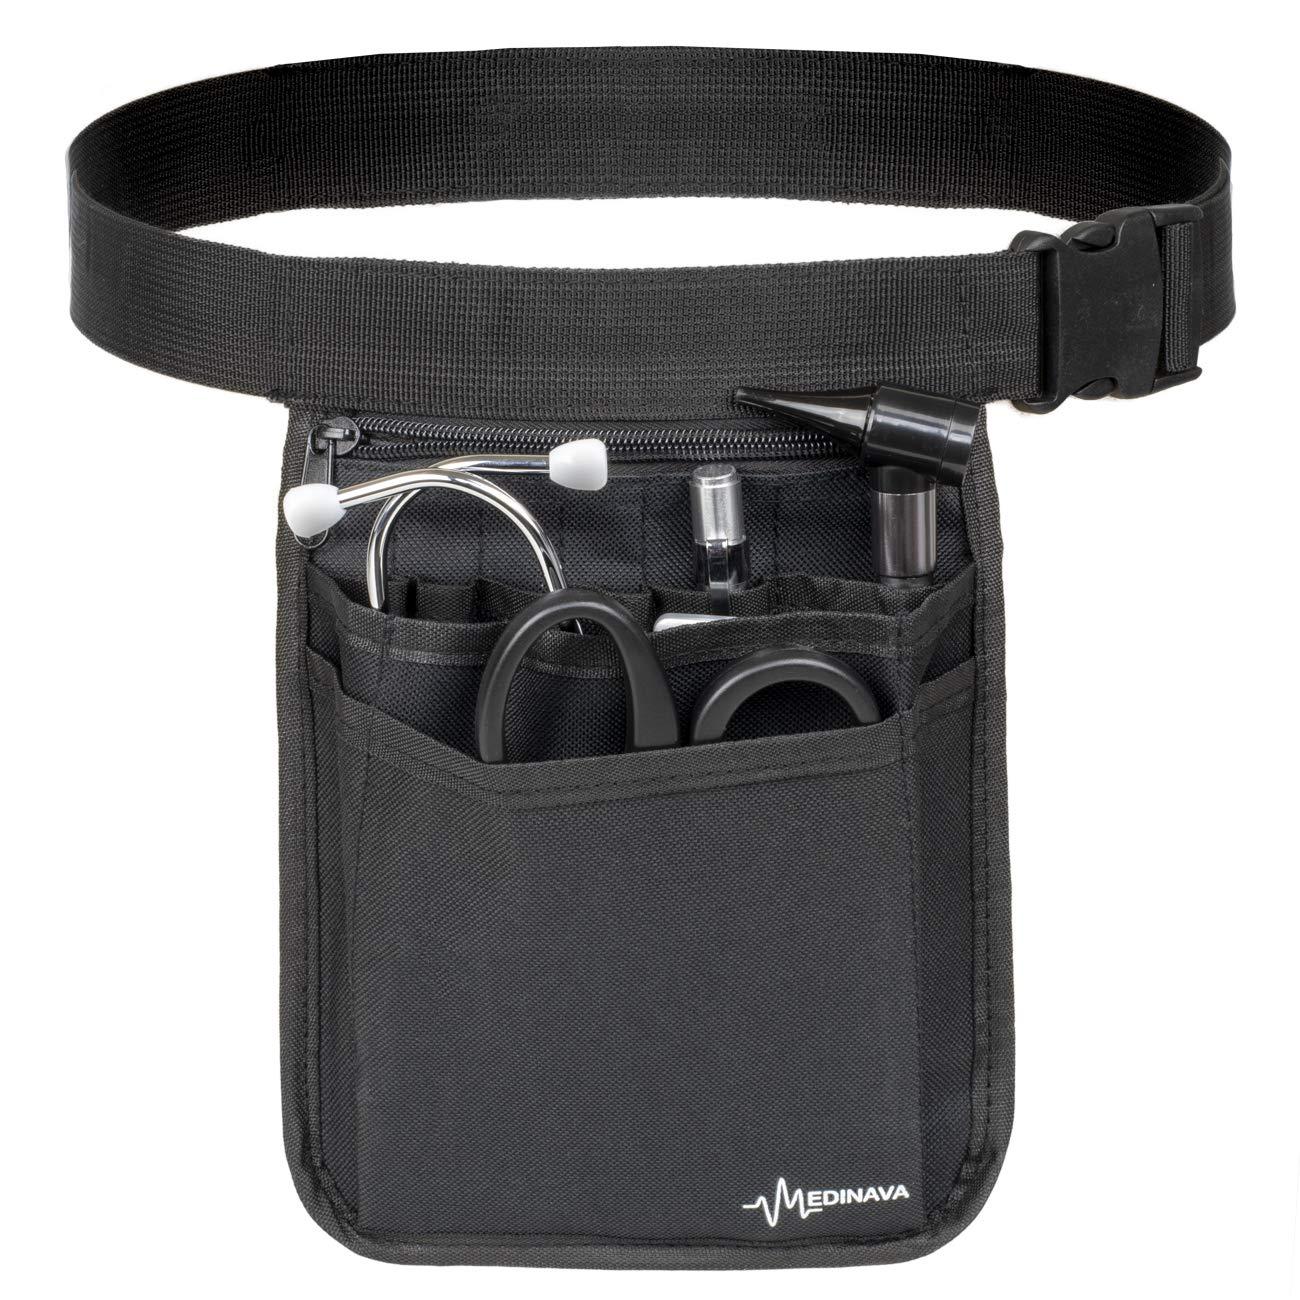 Medical Organizer Belt for Nurses - Multi-Compartment Bag Nurse Organizer Utility Medical Gear Hip Bag | Medical Care Kit Utility Waist Pack | Nurse Pocket Organizer Fanny Pack for Medical Basics by Medinava